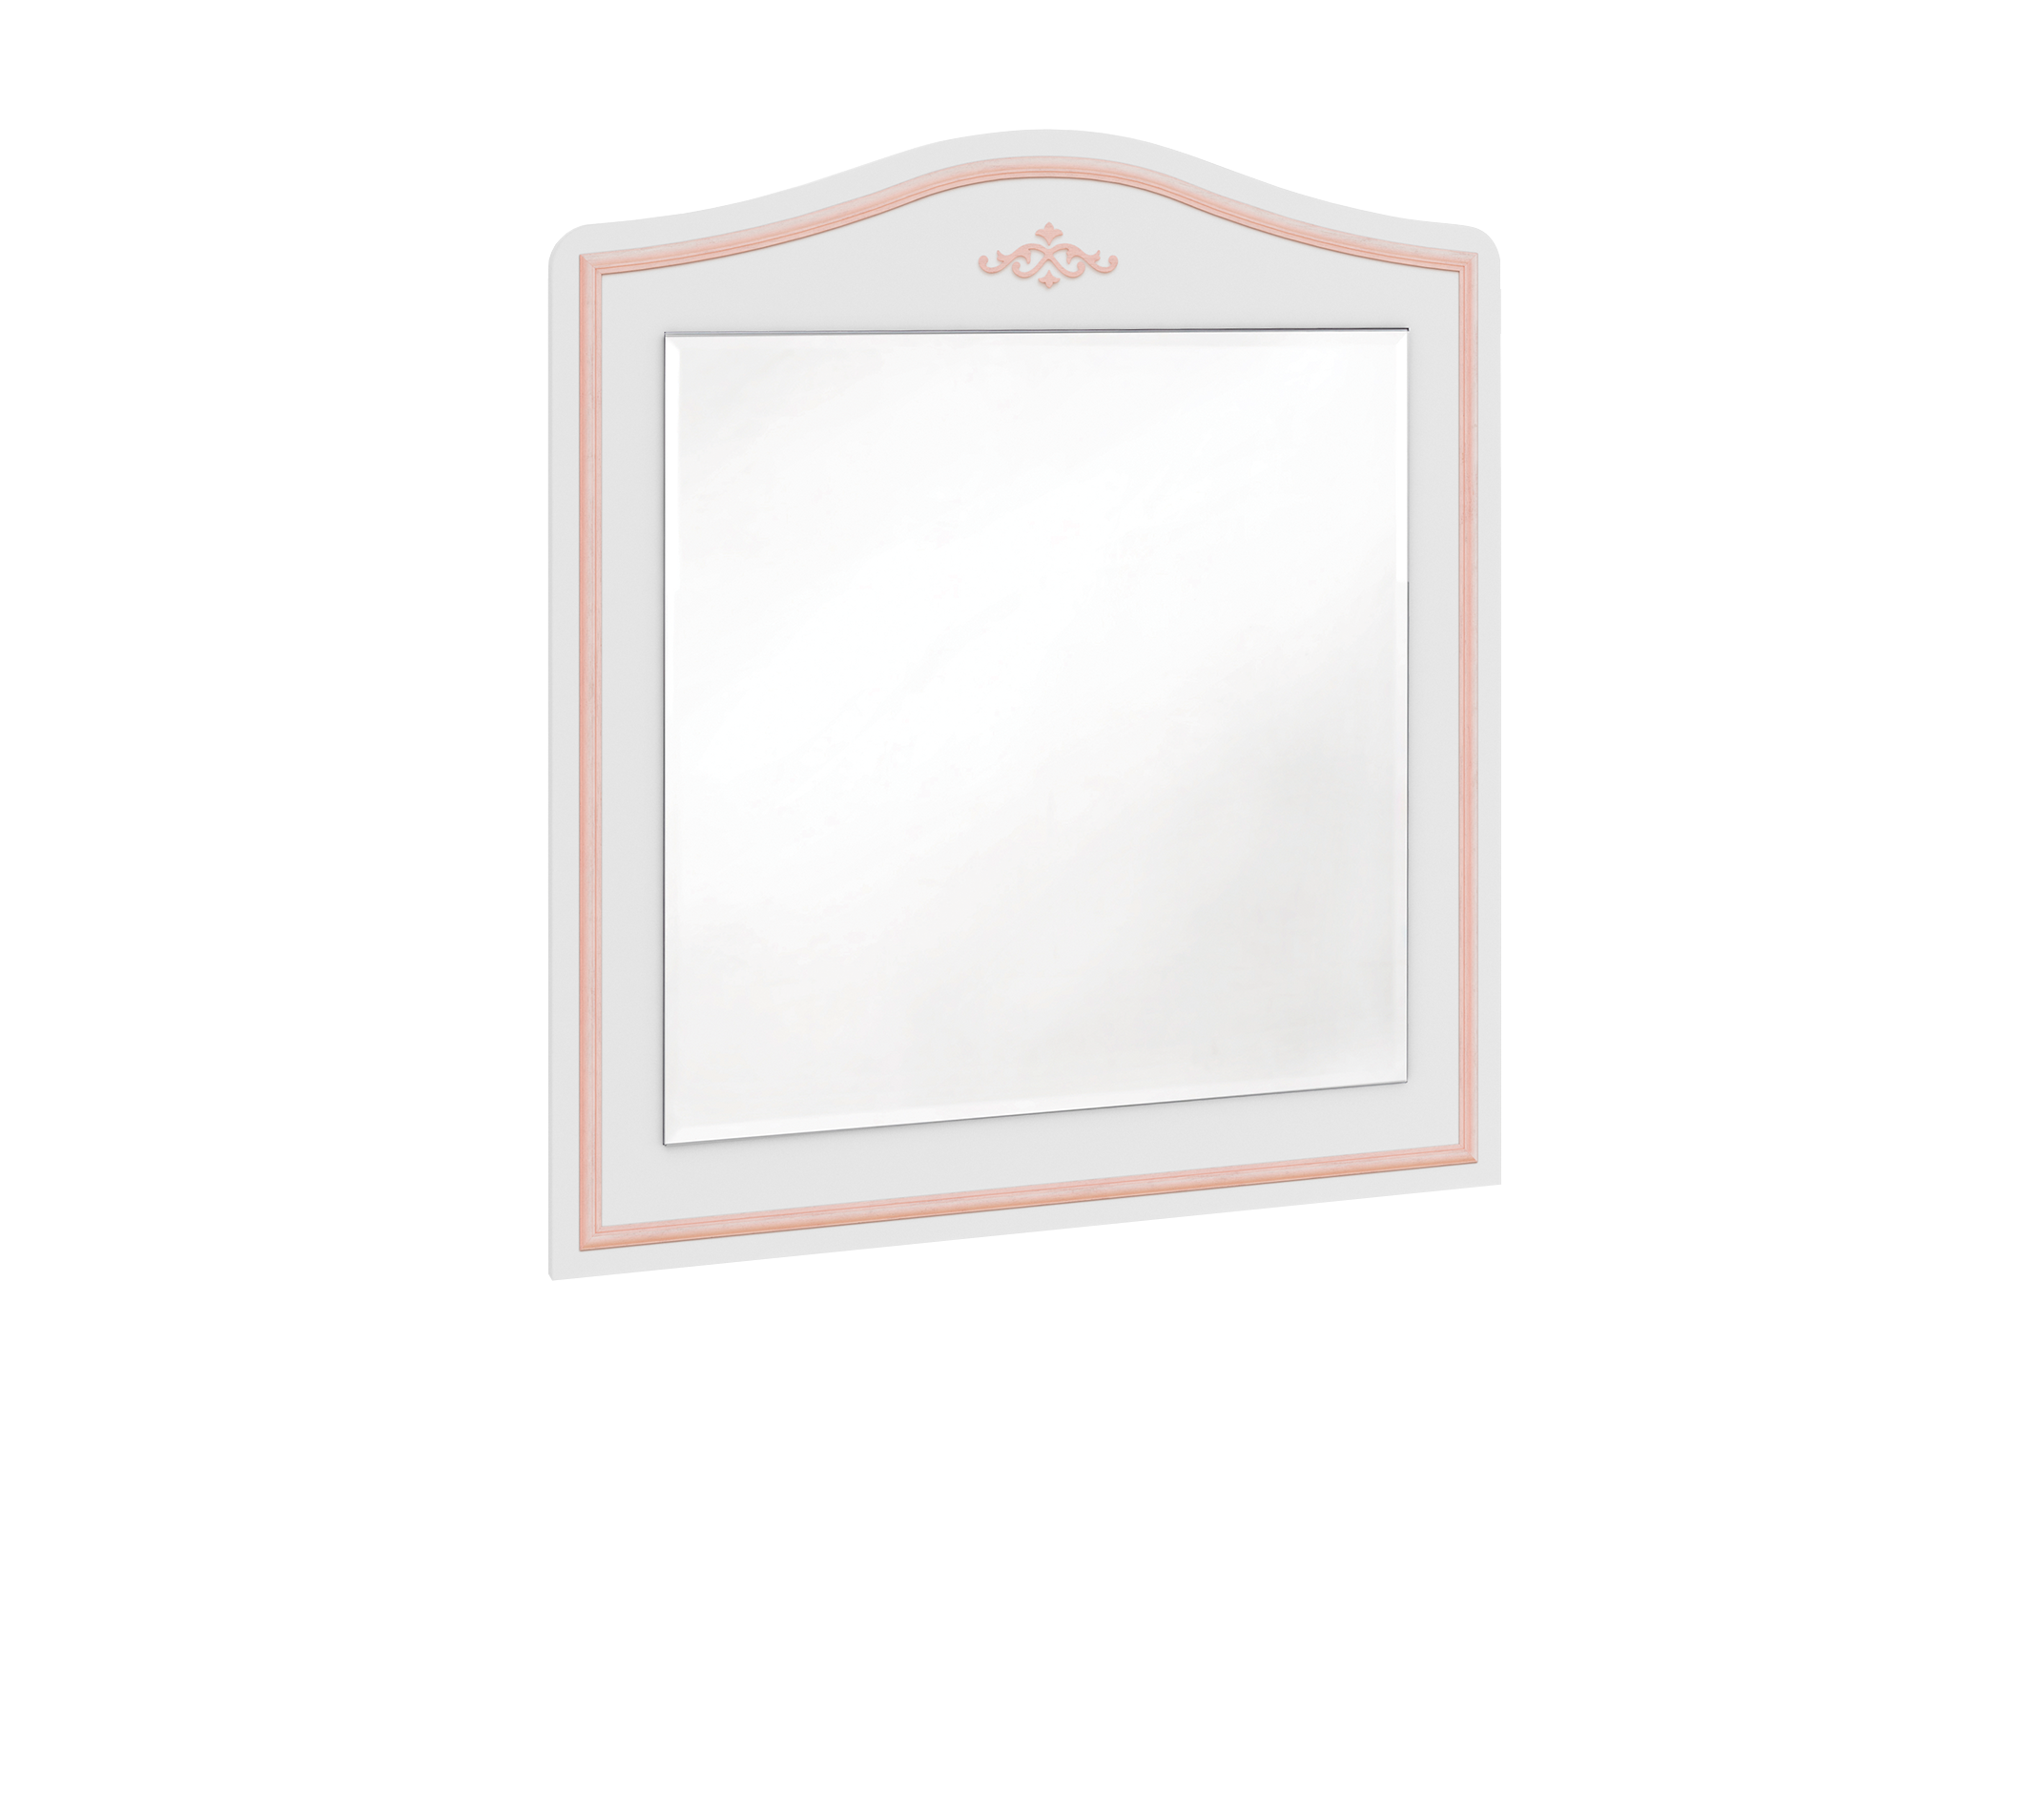 Oglinda decorativa cu rama din pal Selena Pink Alb / Roz, l73xH90 cm somproduct.ro